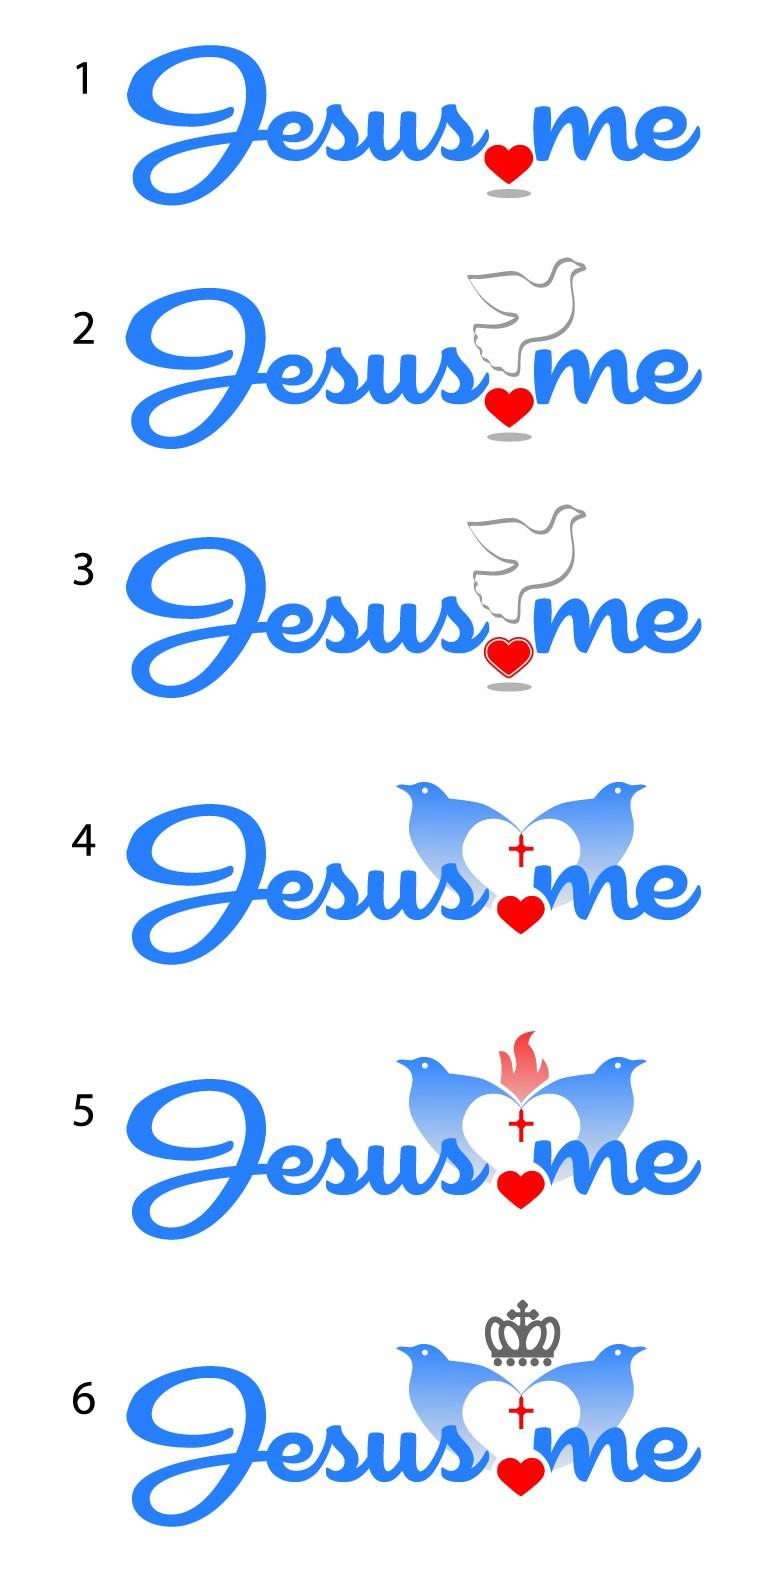 Jesus.me needs a new logo